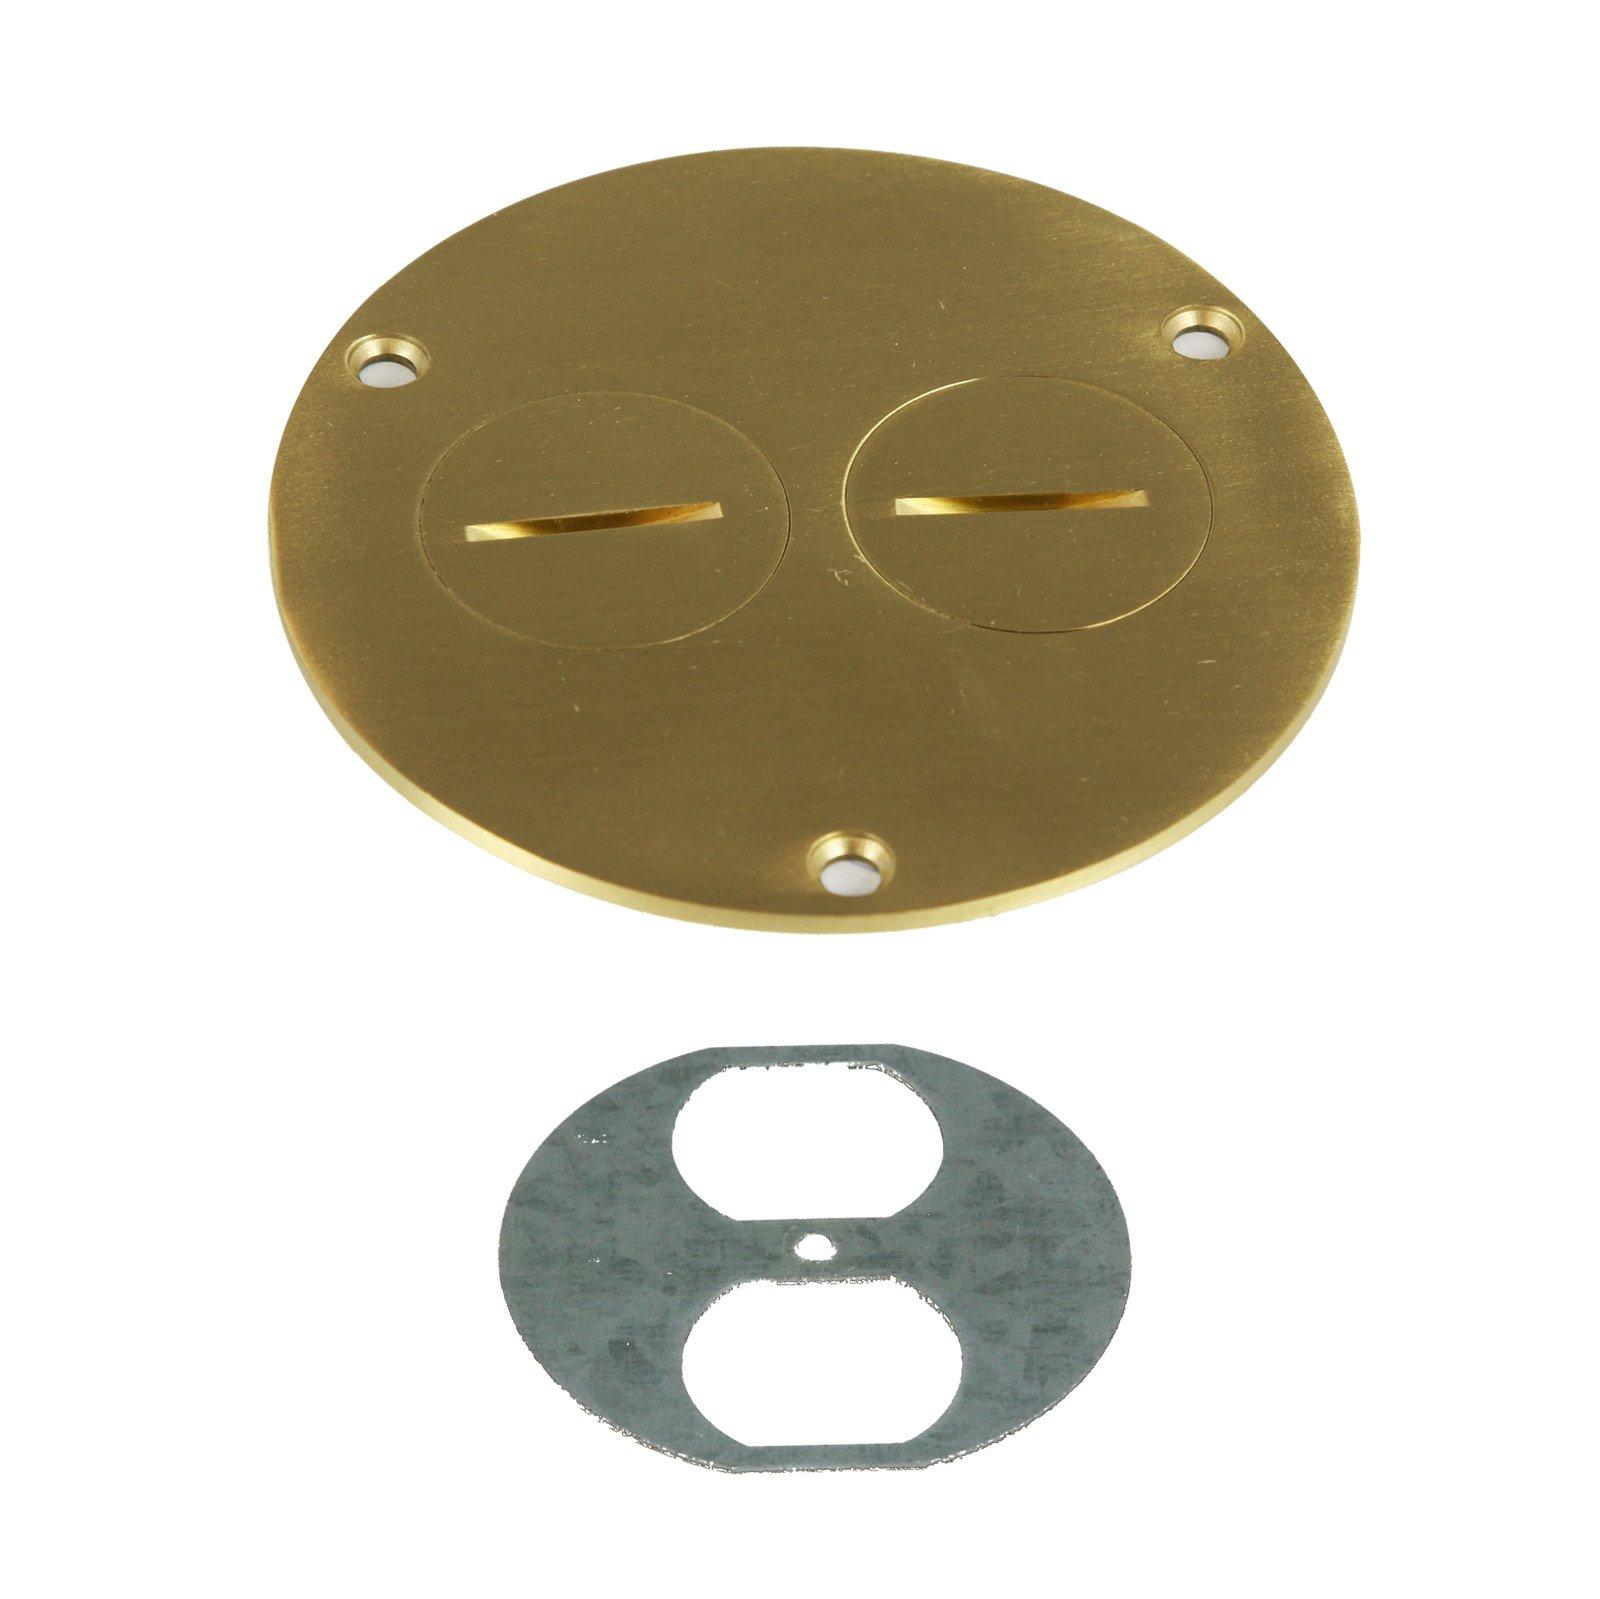 ENERLITES Screw Cap Floor Box Cover, 4'' Diameter, 20A Tamper-Weather Resistant Receptacle Outlet, Watertight Gaskets, 975501-C, UL Listed, Brass by ENERLITES